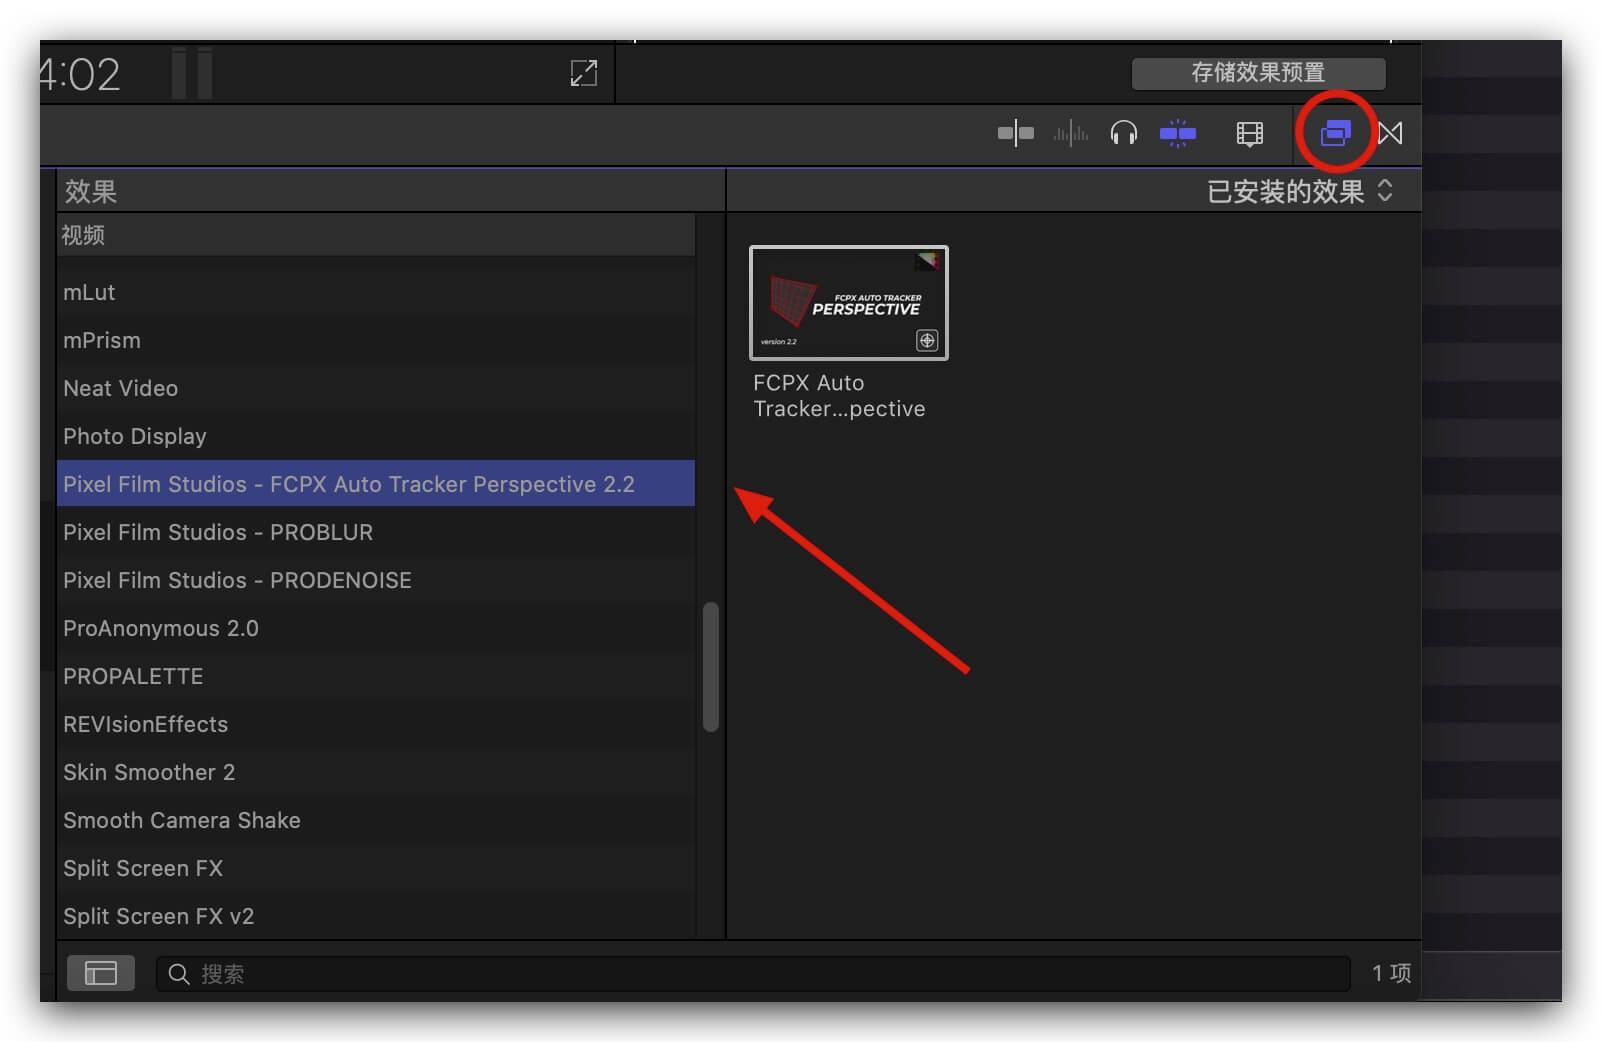 fcpx插件 四点平面自动跟踪透视特效 支持 fcpx 10.5.1 Auto Tracker Perspective 2.2